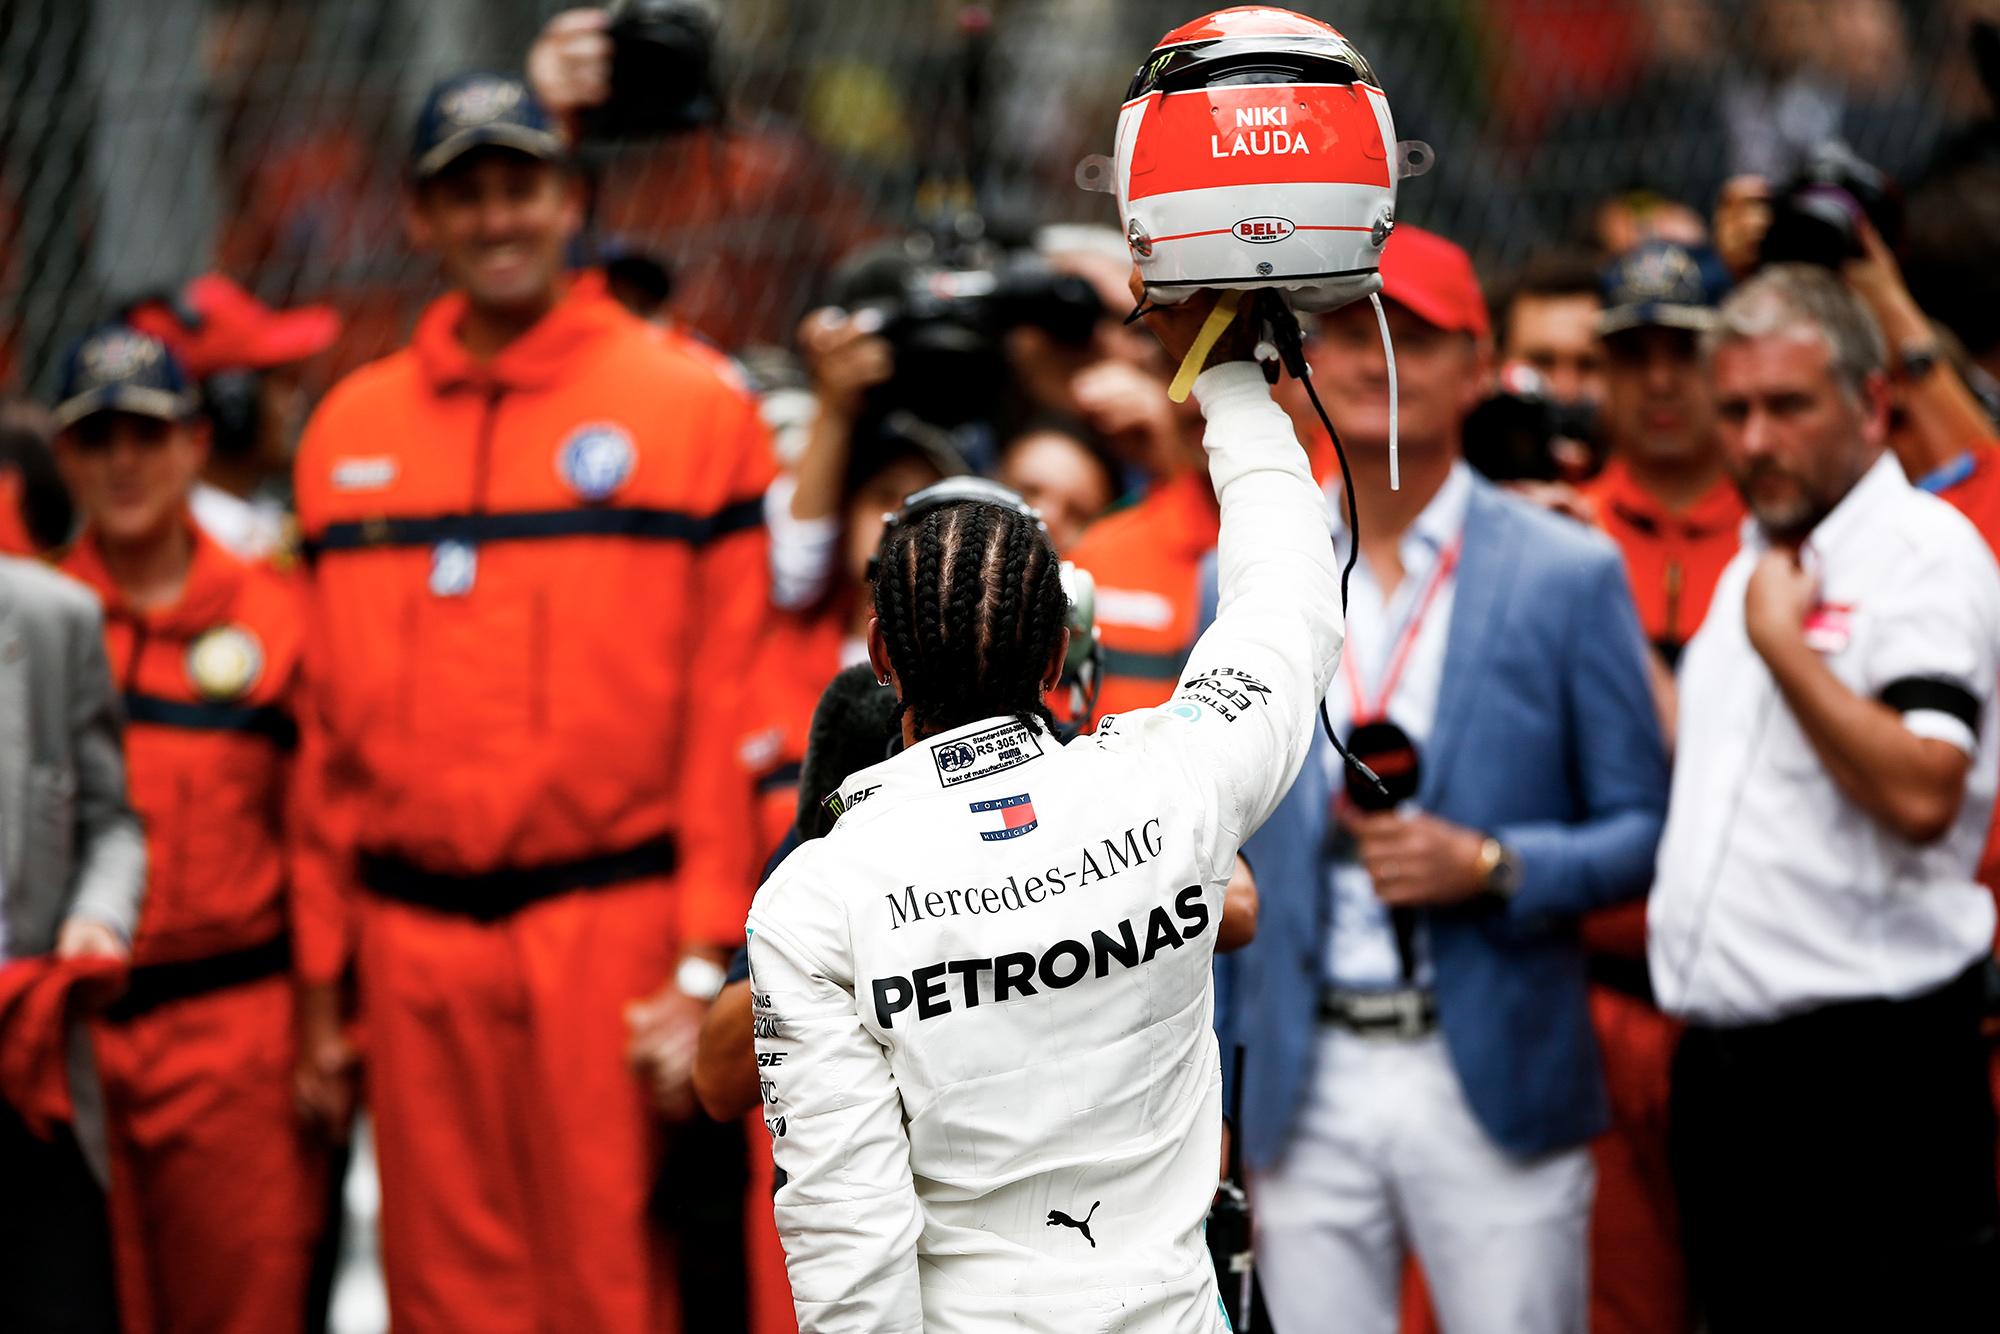 Lewis Hamilton raises his Niki Lauda tribute helmet at the 2019 Monaco Grand Prix